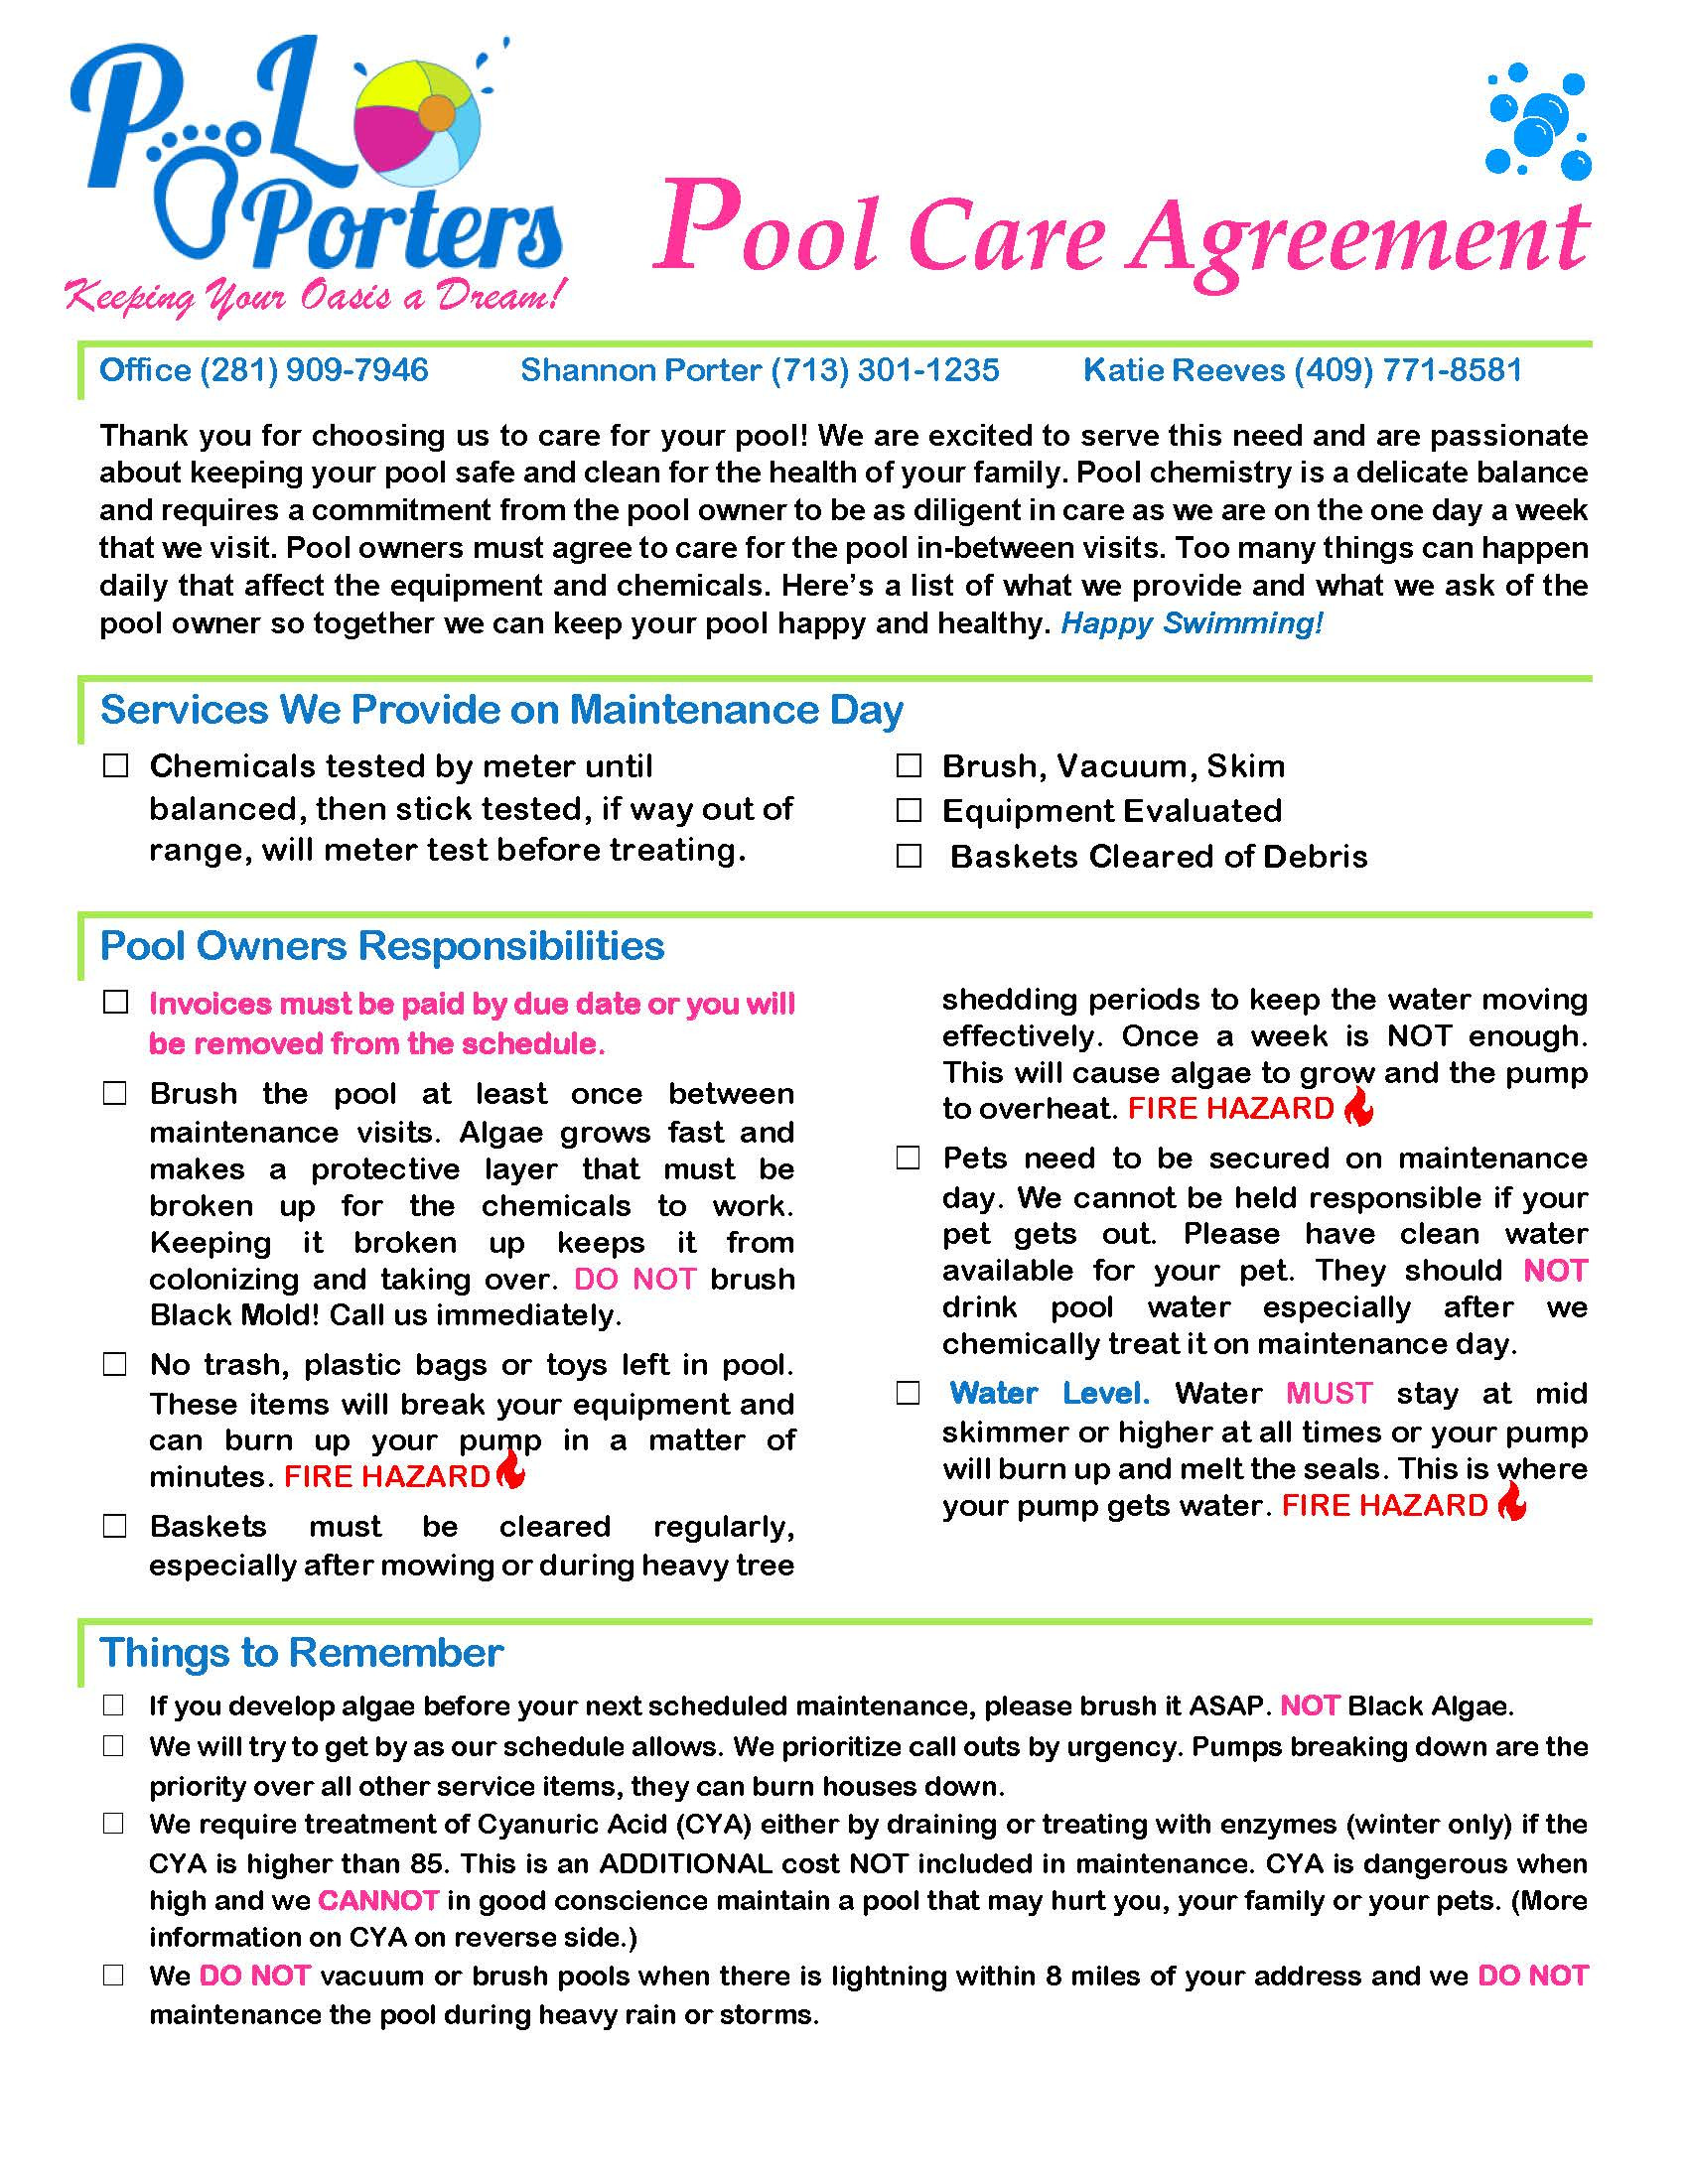 Pool Care Checklist Final_Page_1.jpg